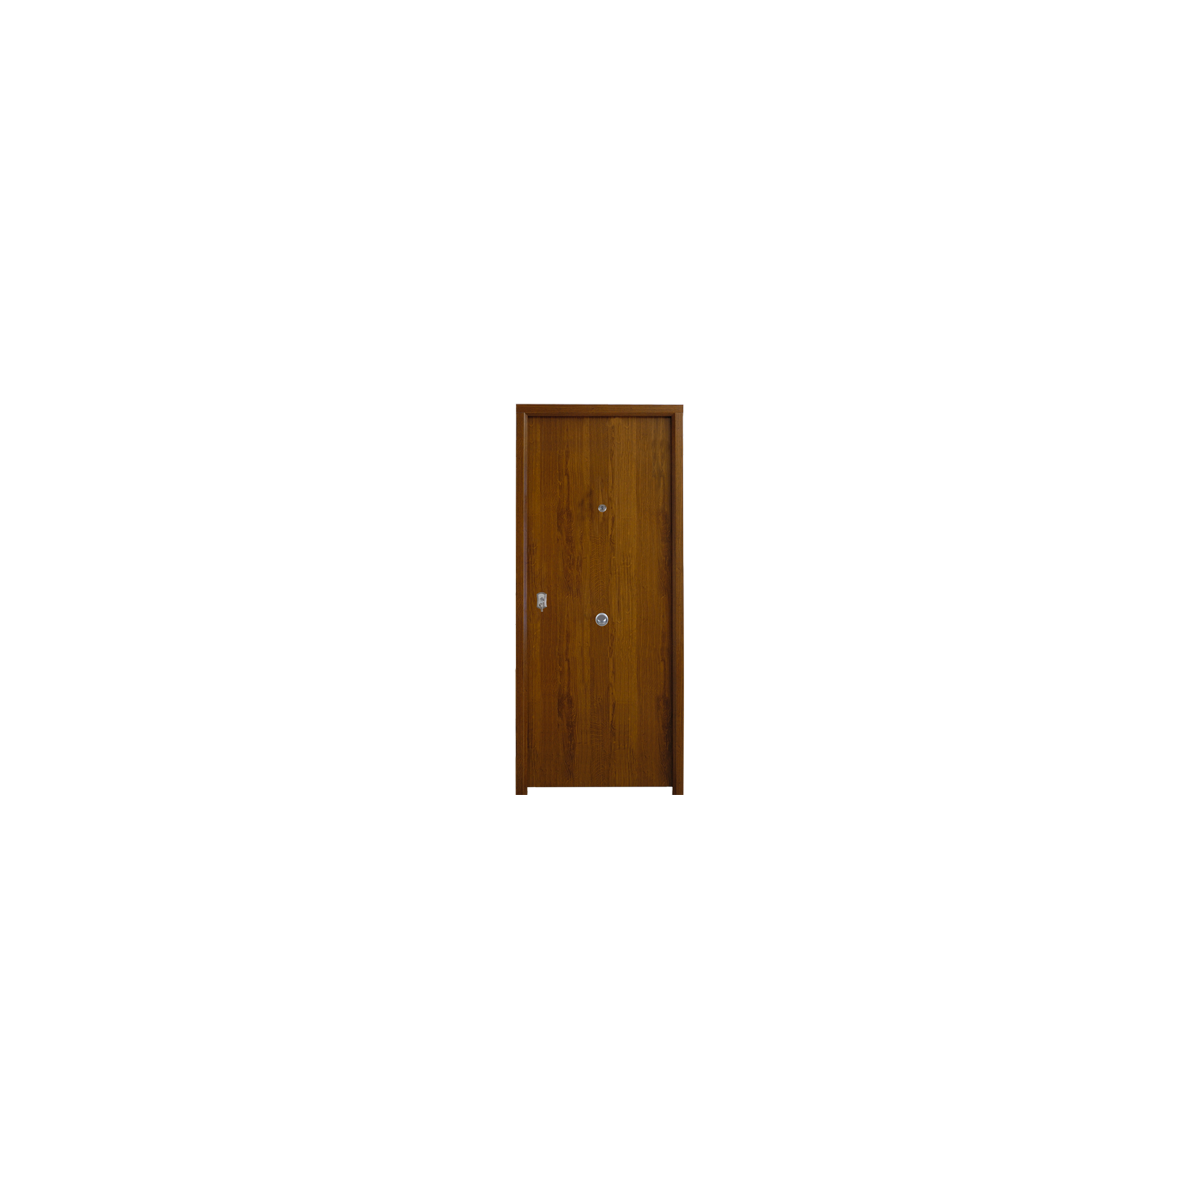 Puerta acorazada Lisa - Puertas acorazadas Serie B4-BL - Marca Cearco